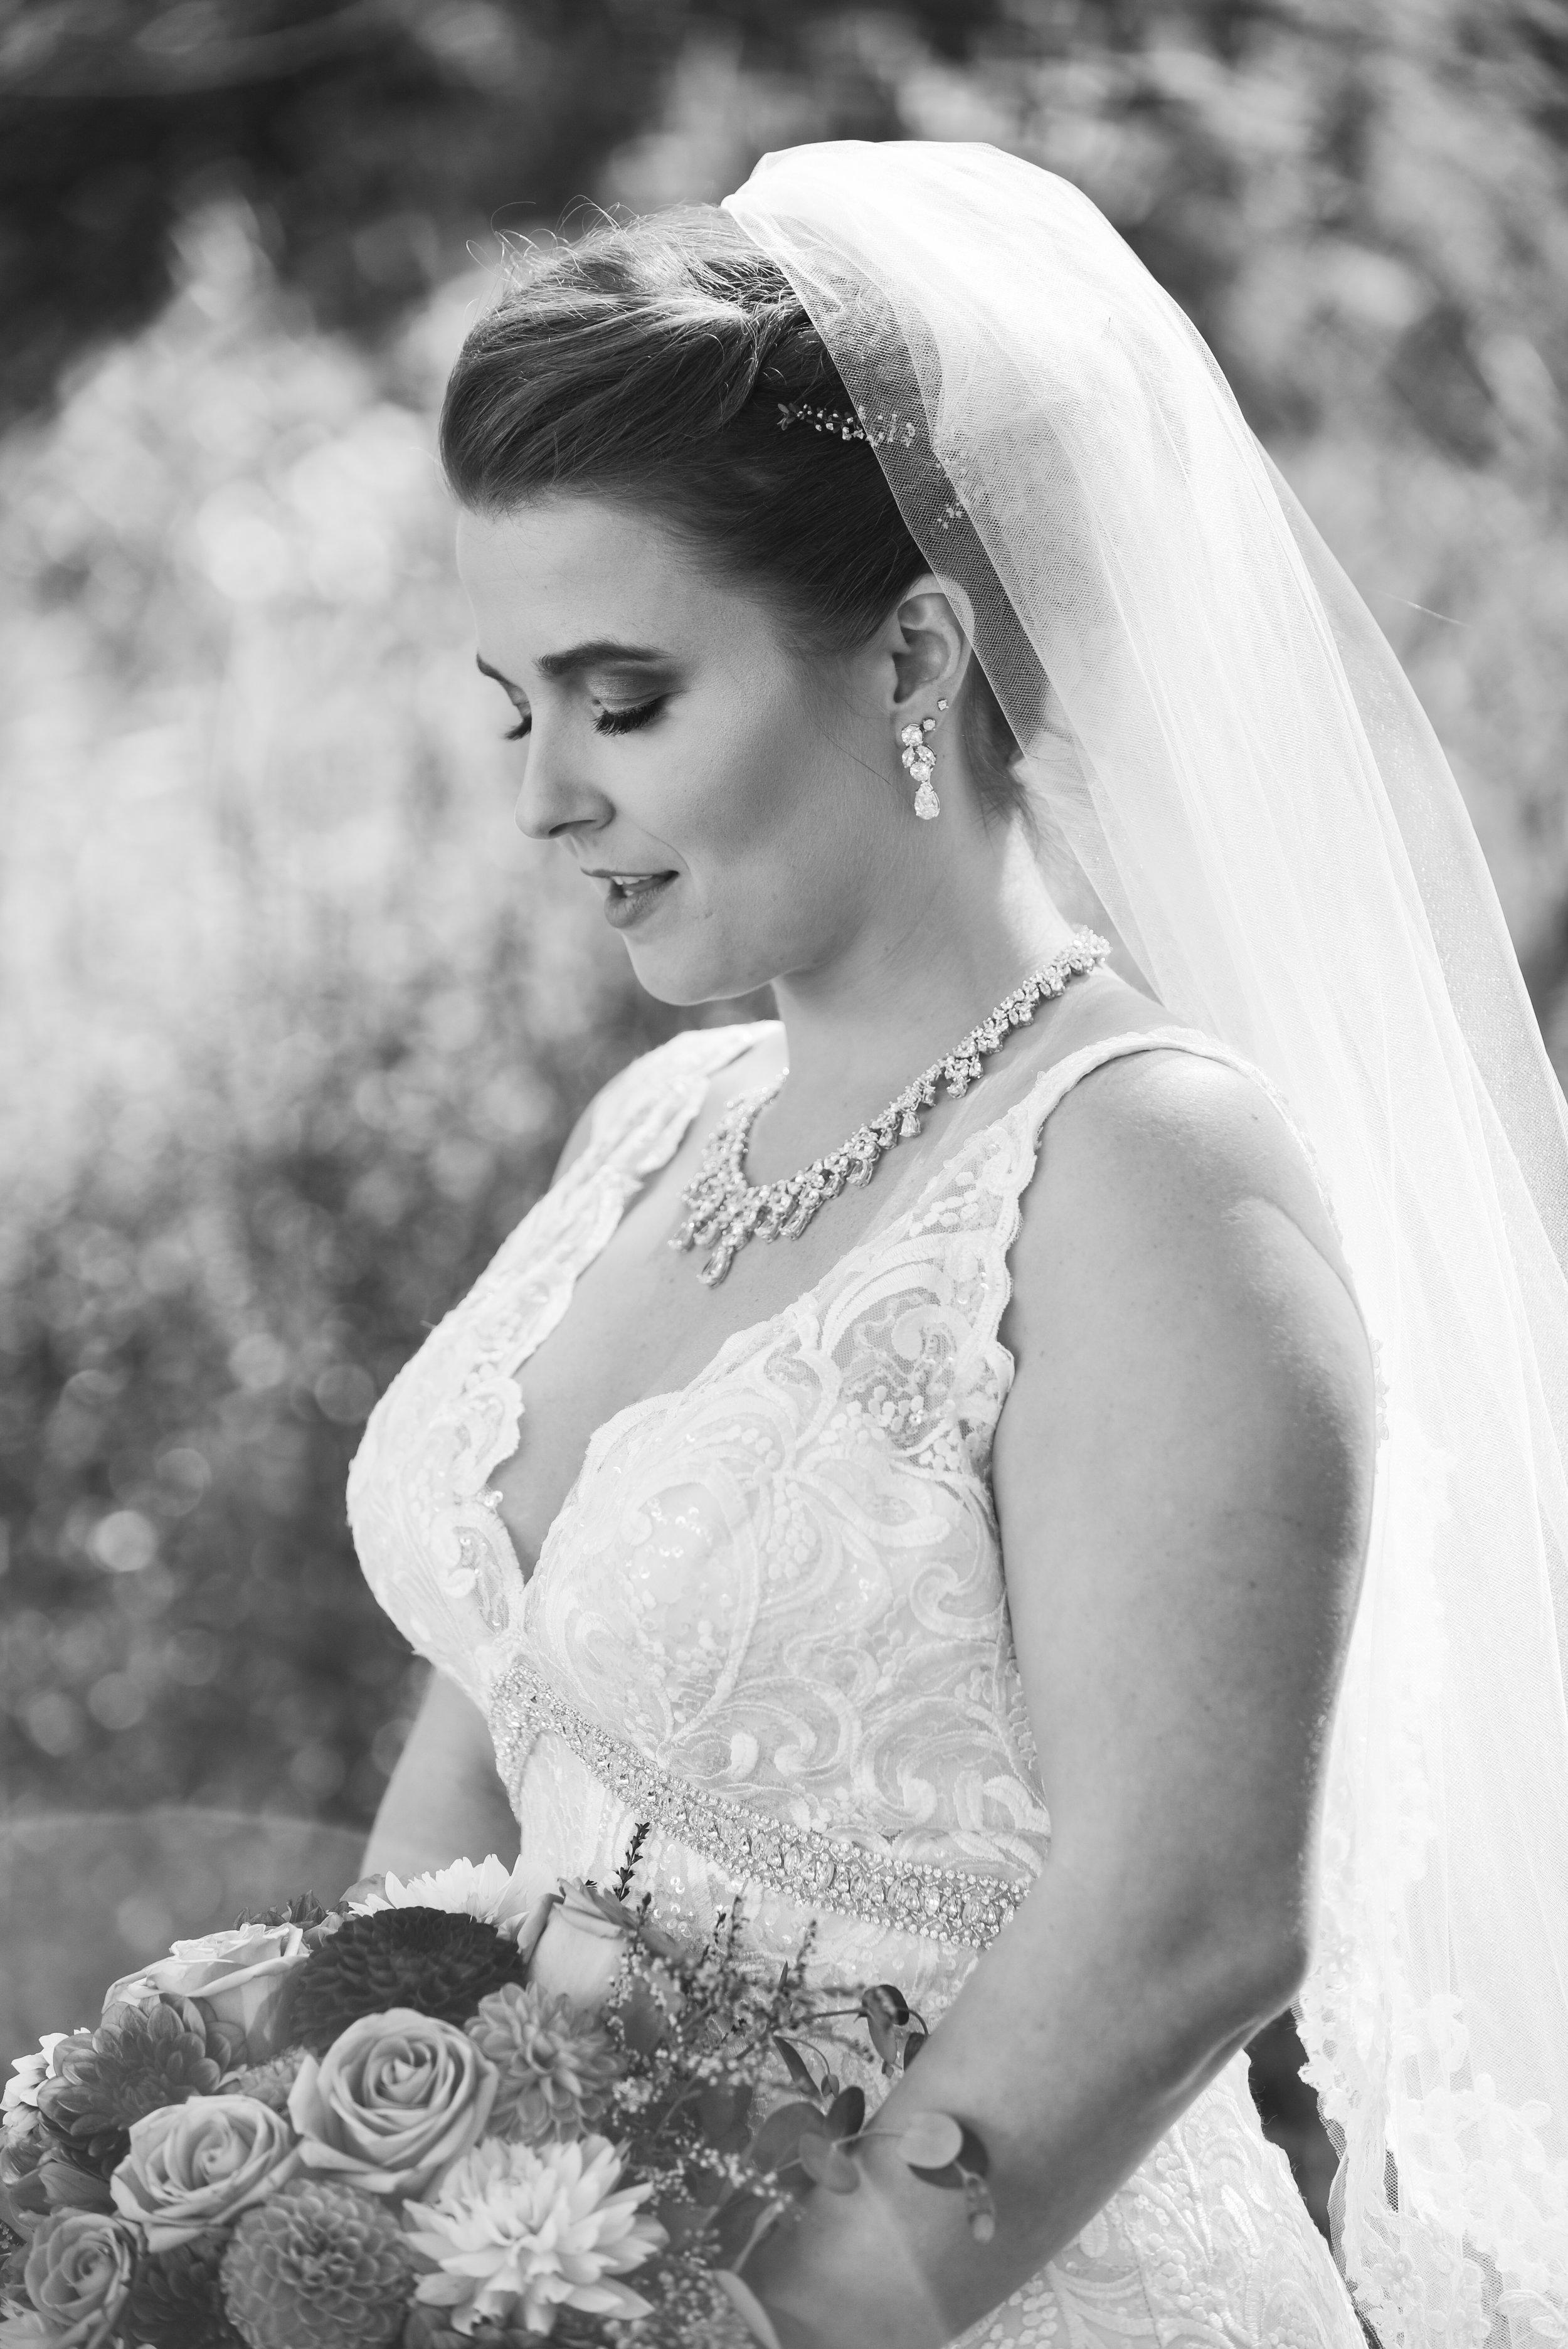 Traverse City Wedding Photography, Meridian Photography, Northern Michigan Wedding Photographers